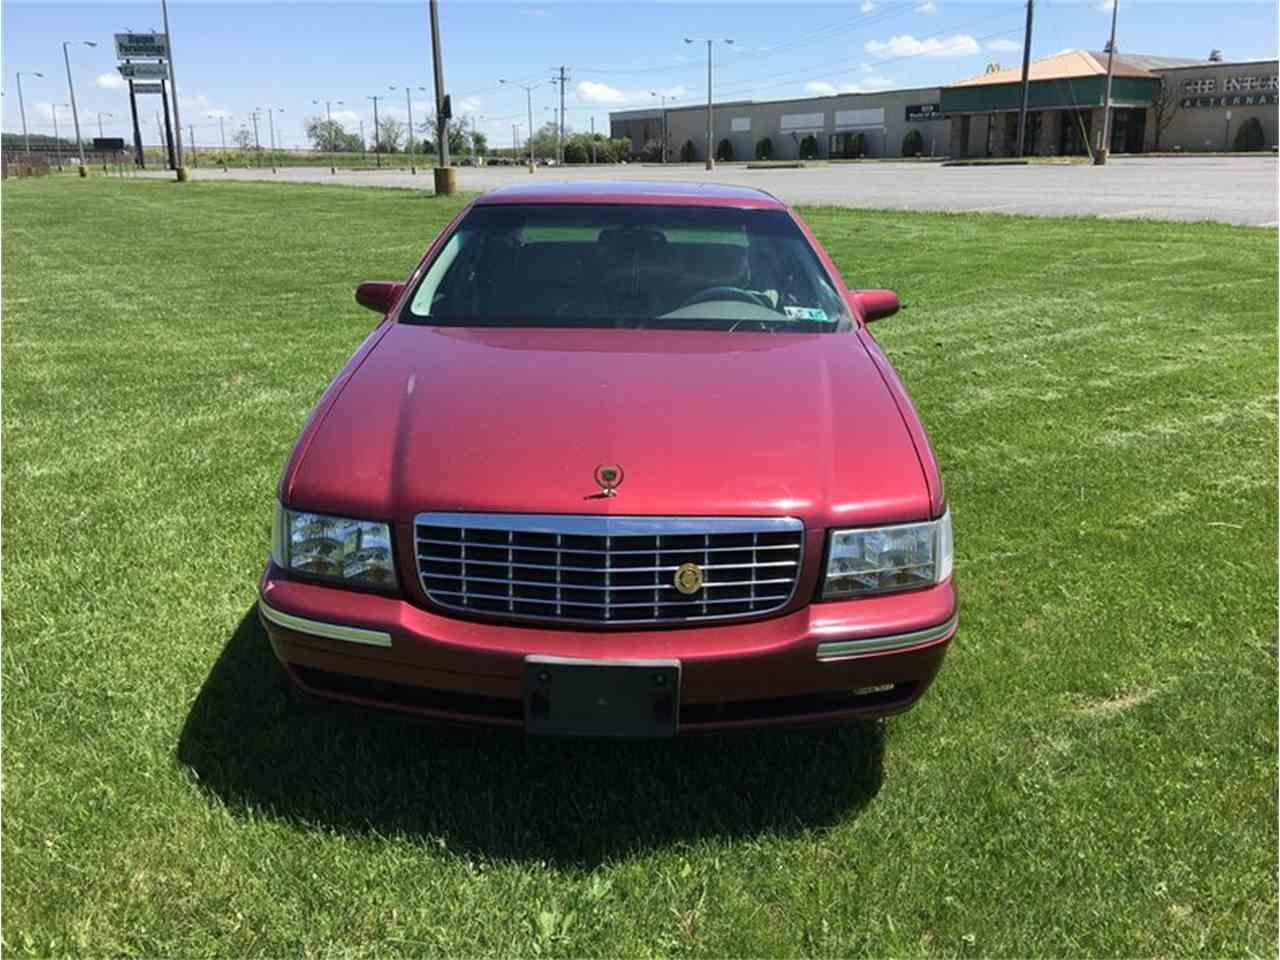 Large Picture of 1998 Cadillac 4-Dr Sedan - $7,995.00 - LS0Q